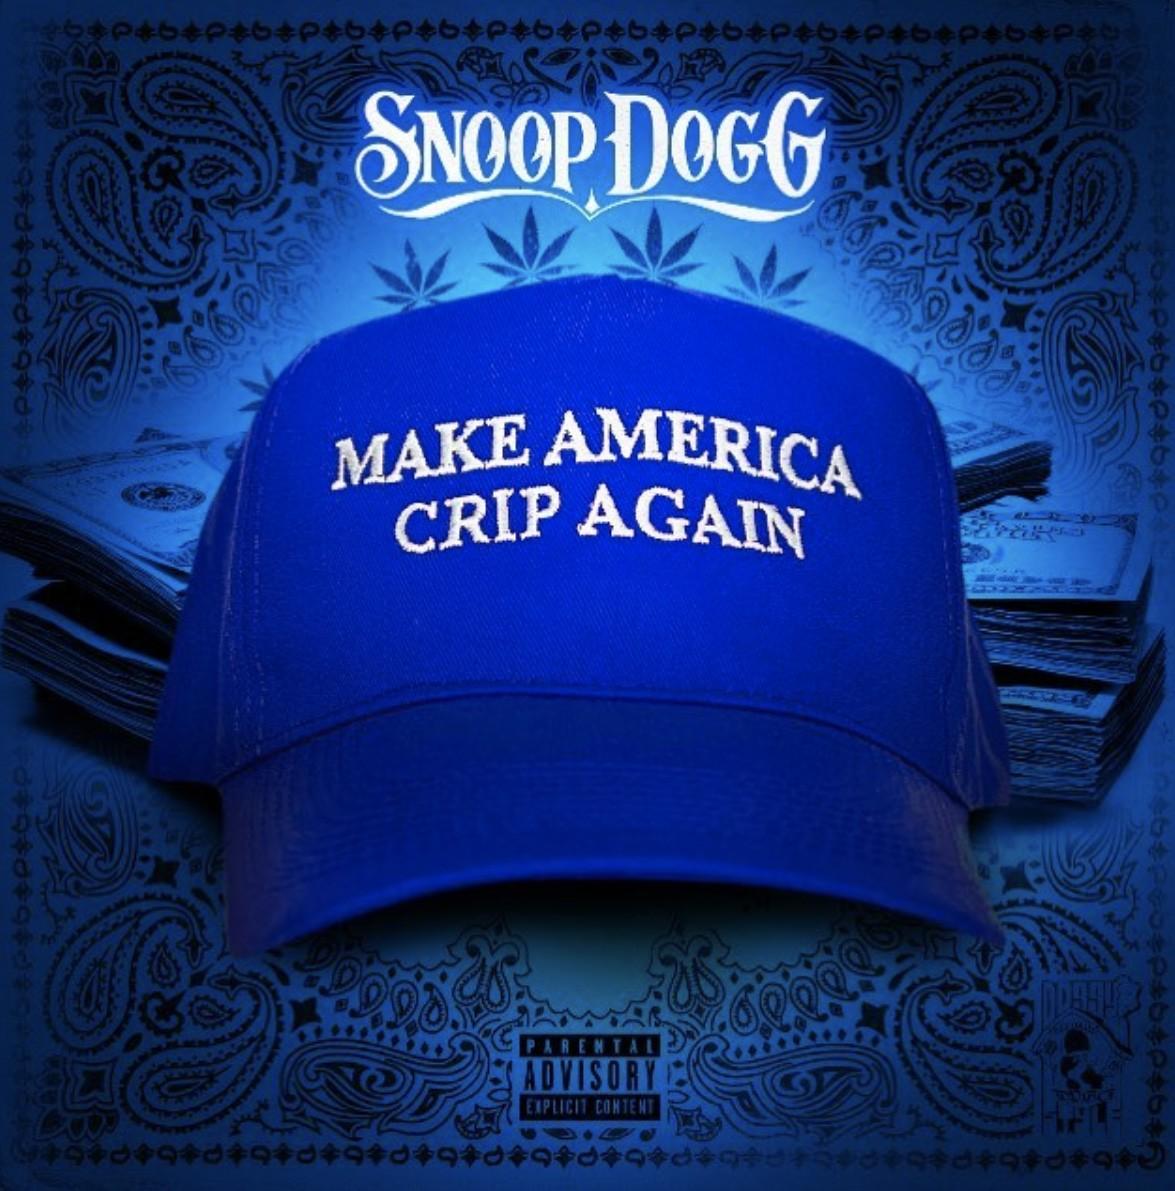 snoop-dogg-1508181117